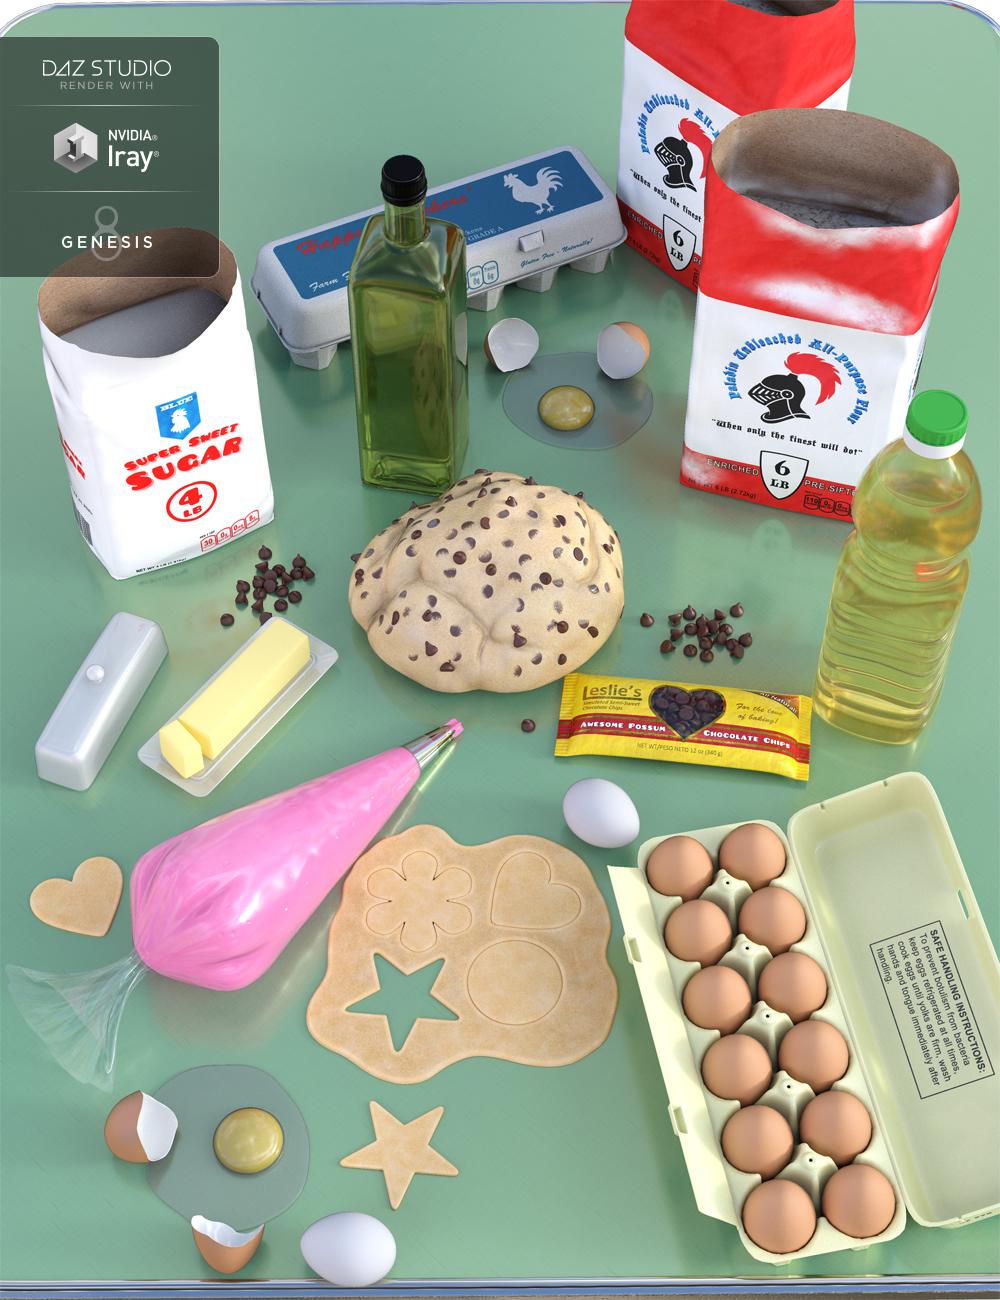 Baking Ingredients by: Rascal3D, 3D Models by Daz 3D